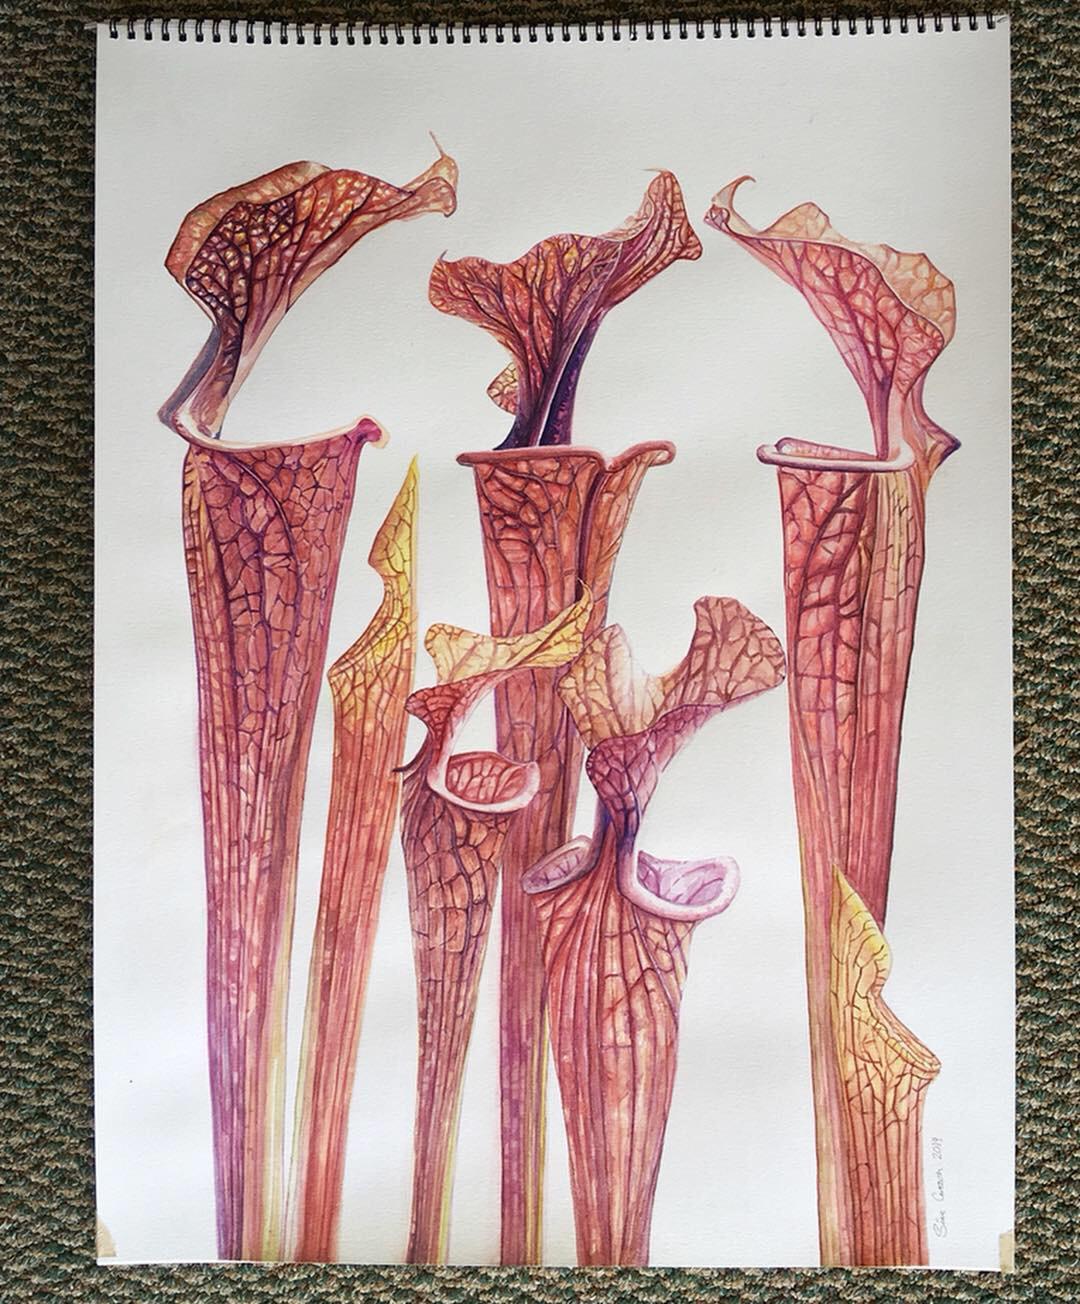 Sarracenia flava var. rubricorpora, 18x24